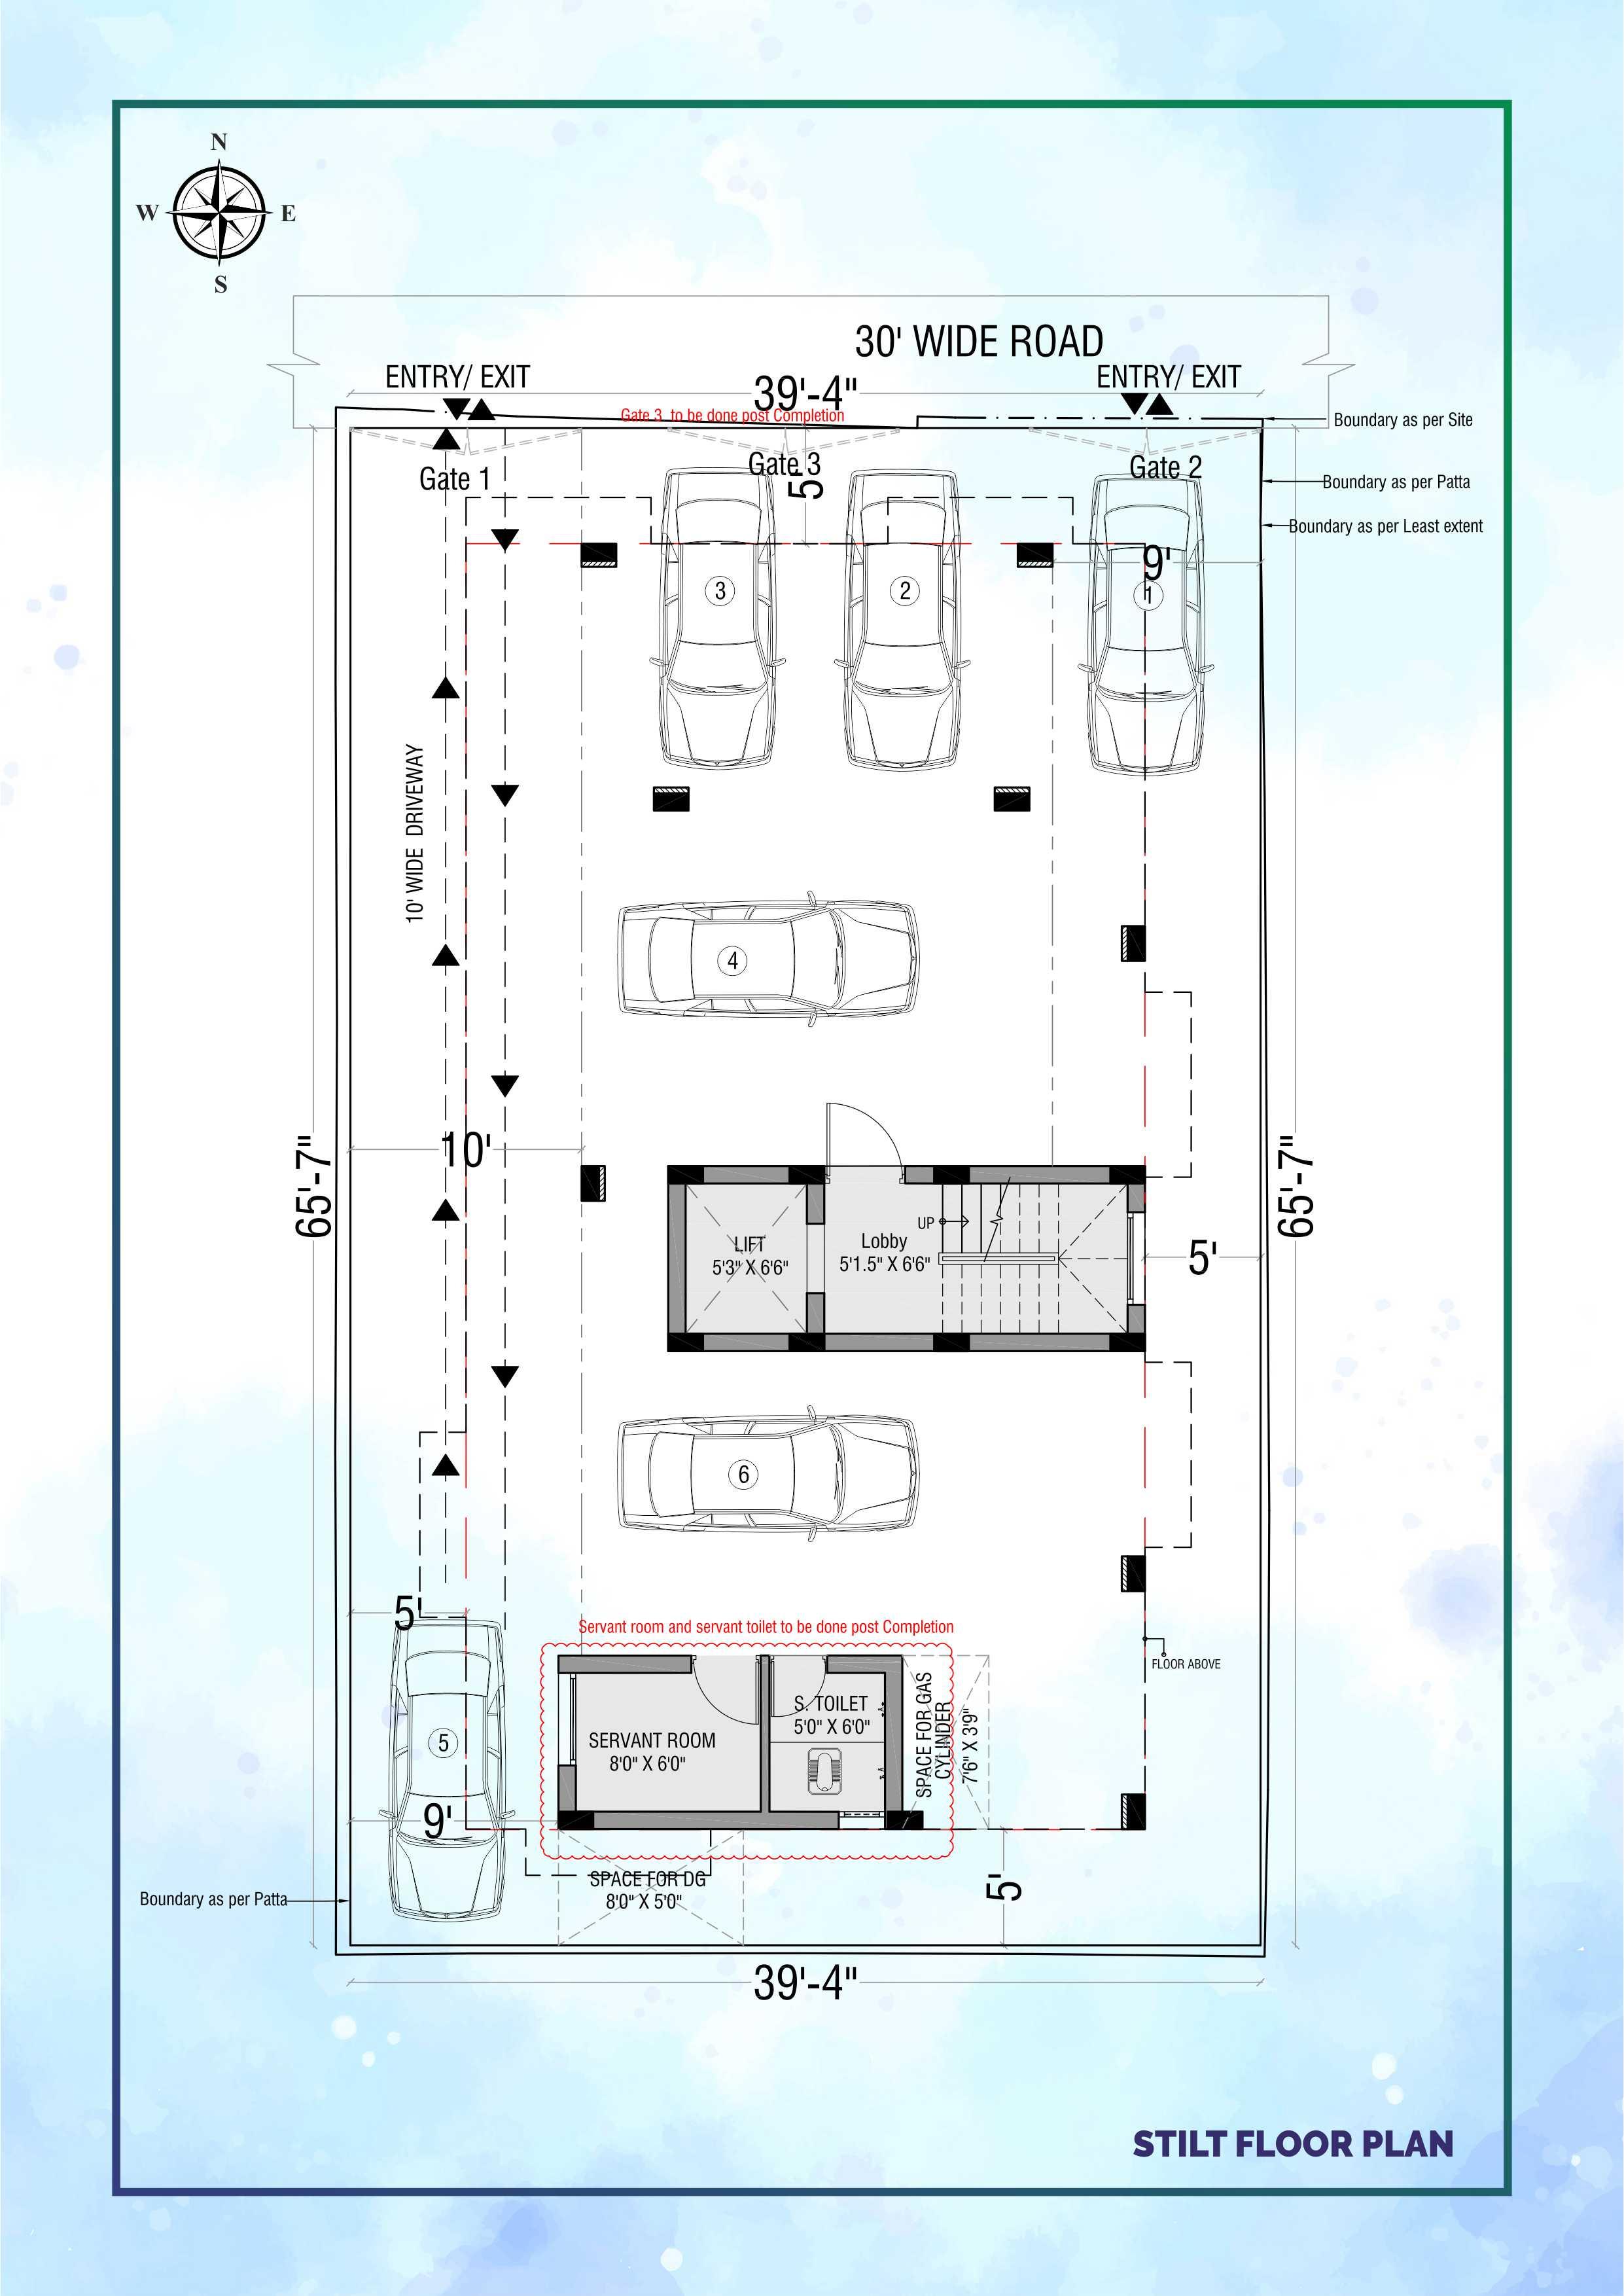 https://www.firmfoundations.in/projects/floorplans/thumbnails/16087227921Mani_Bhavanam_Stilt.jpg